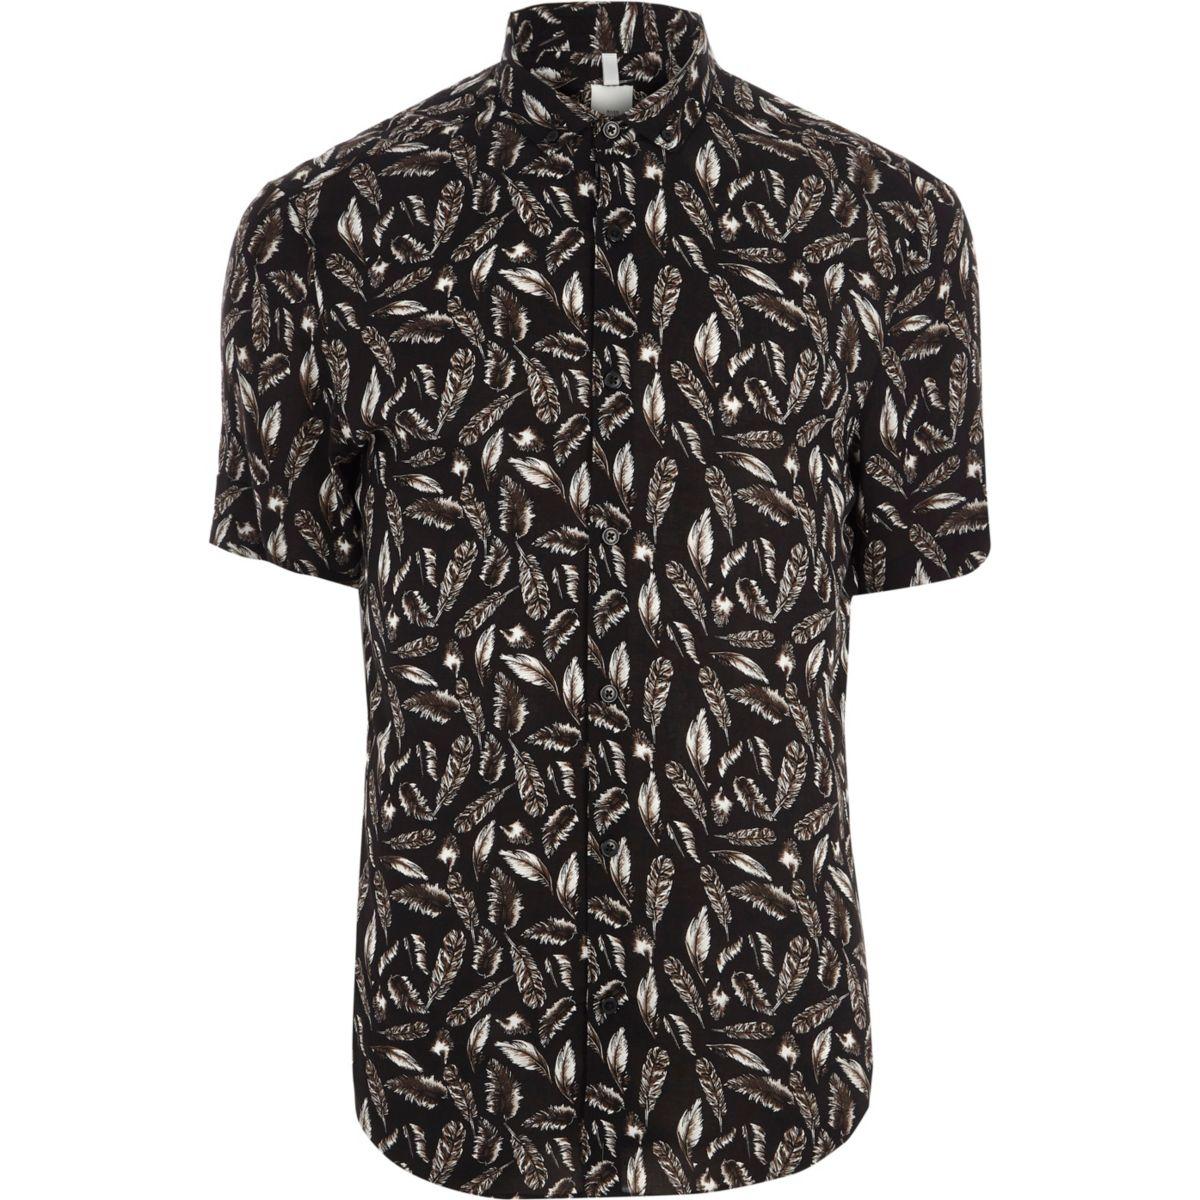 Black feather slim fit short sleeve shirt